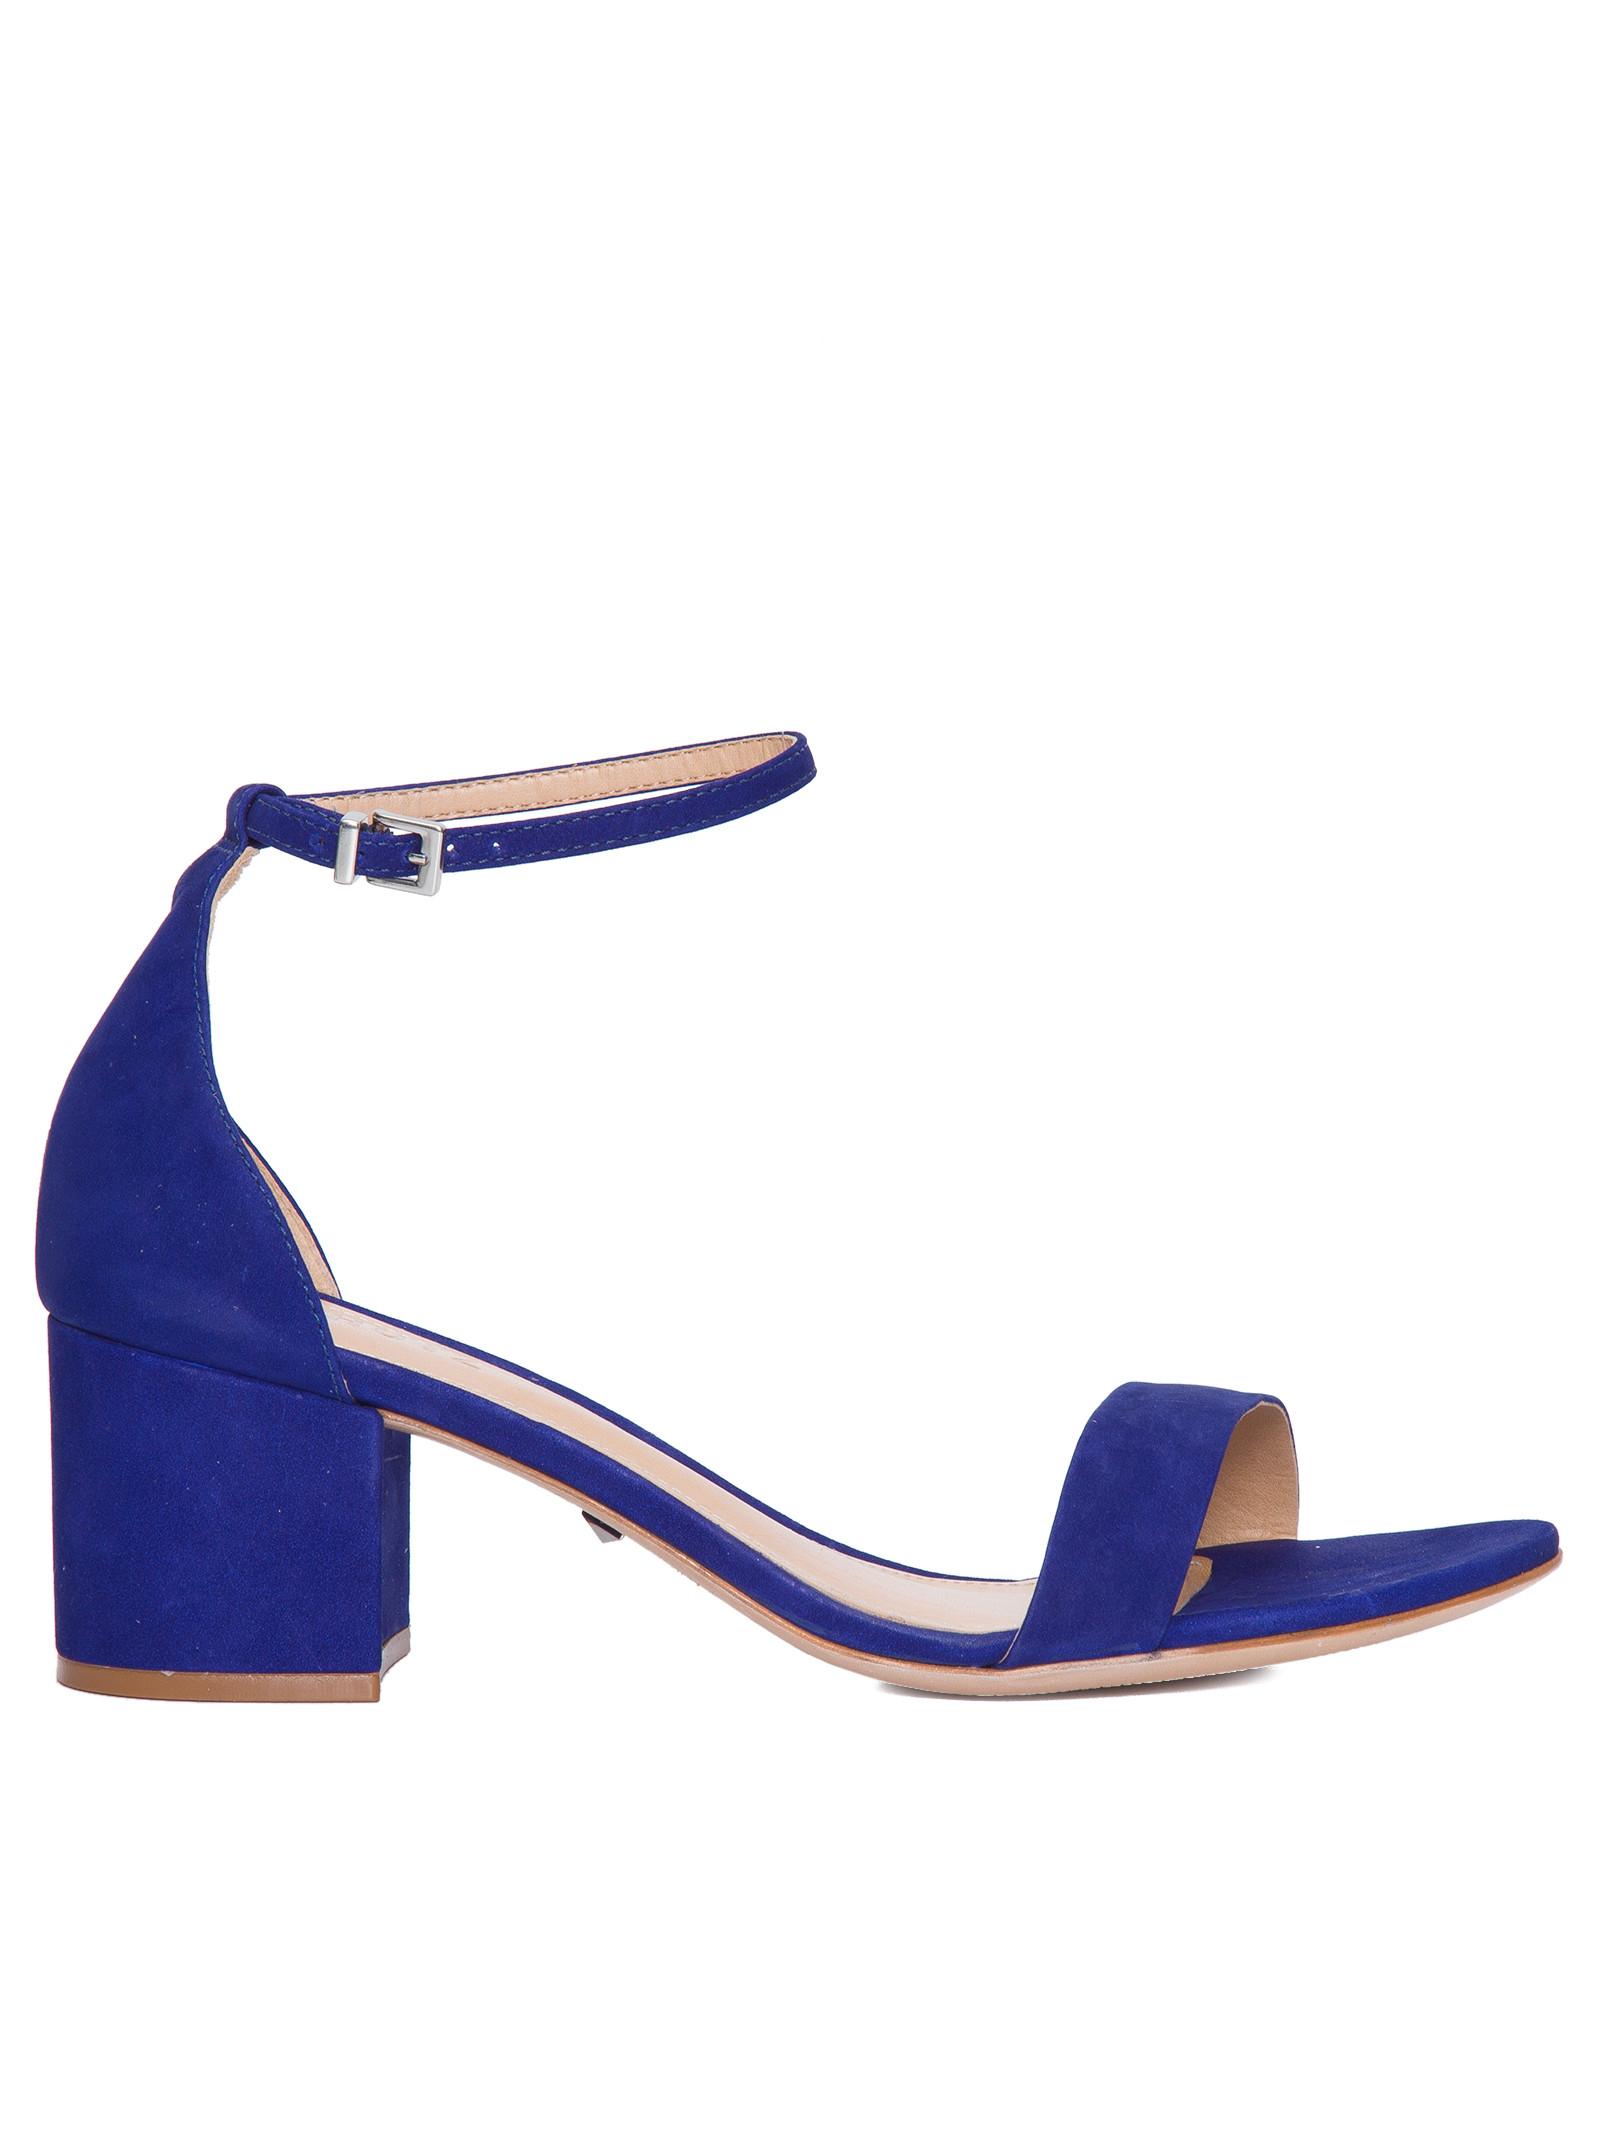 797d37b3c Sandália Feminina Minimal Block Heel - Schutz - Azul - Shop2gether